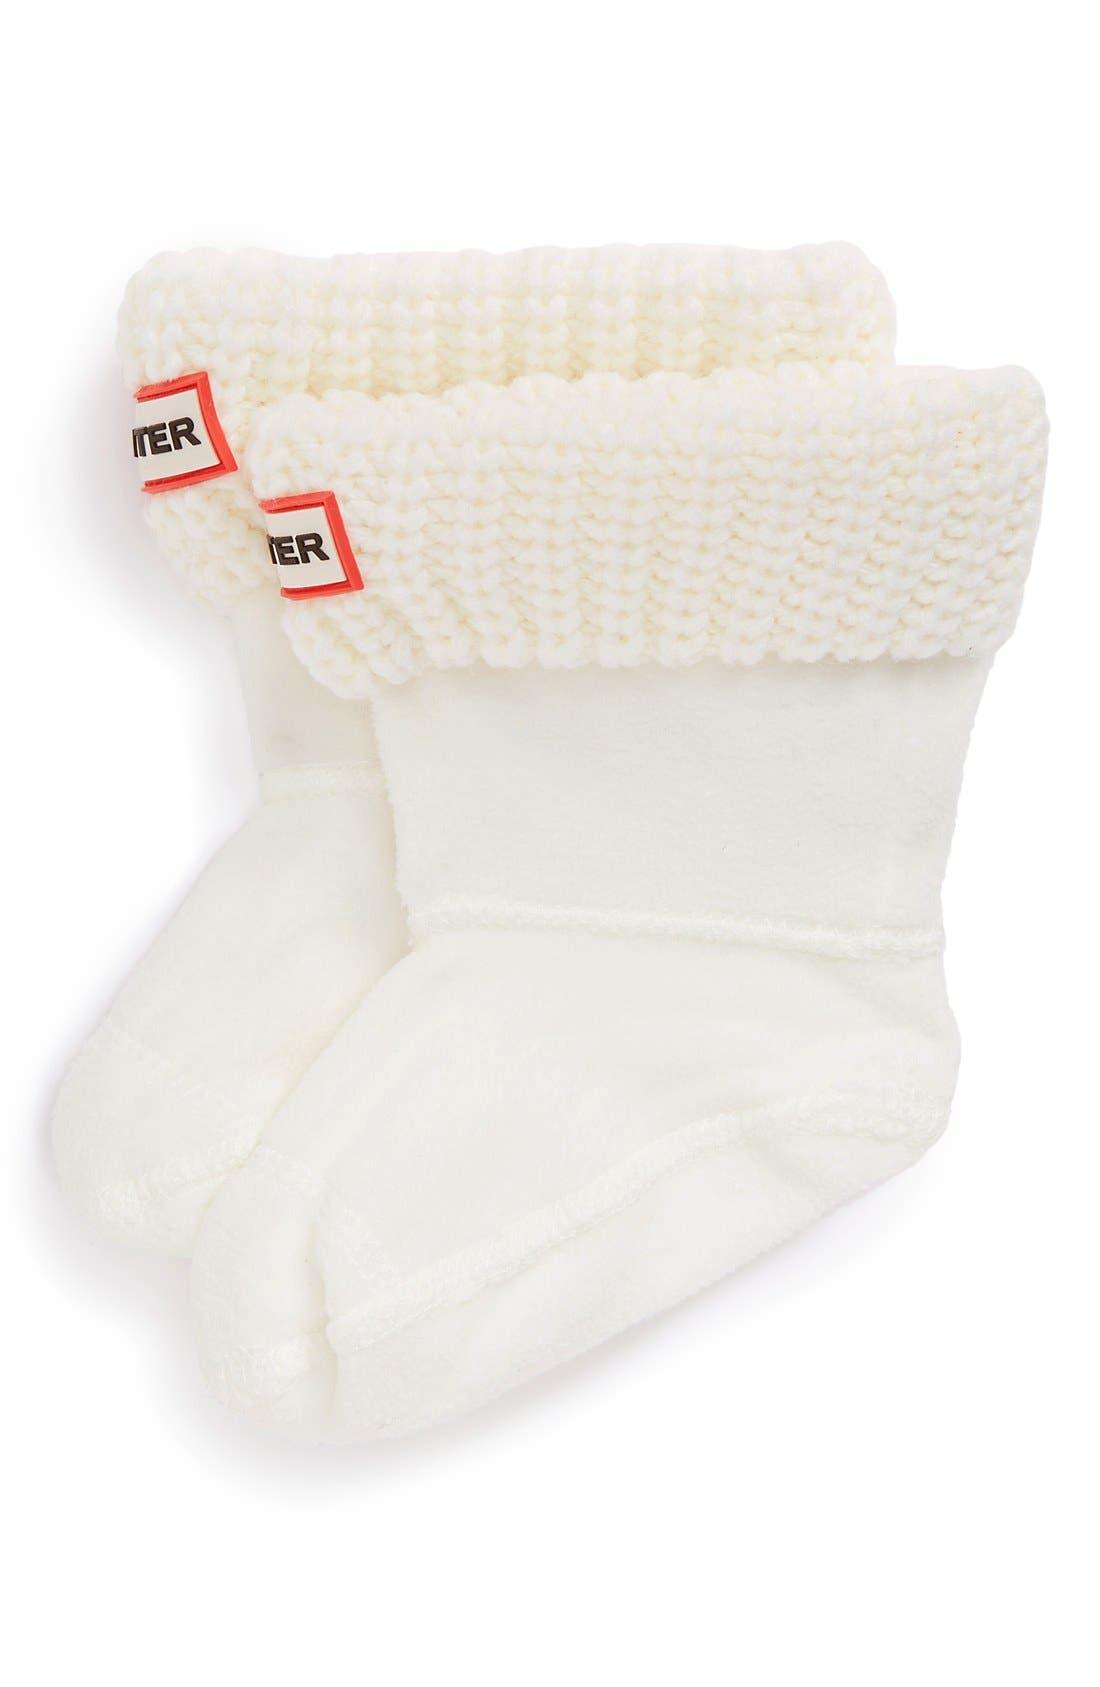 Toddler Girls Hunter Cardigan Knit Cuff Welly Boot Socks Size 57  White